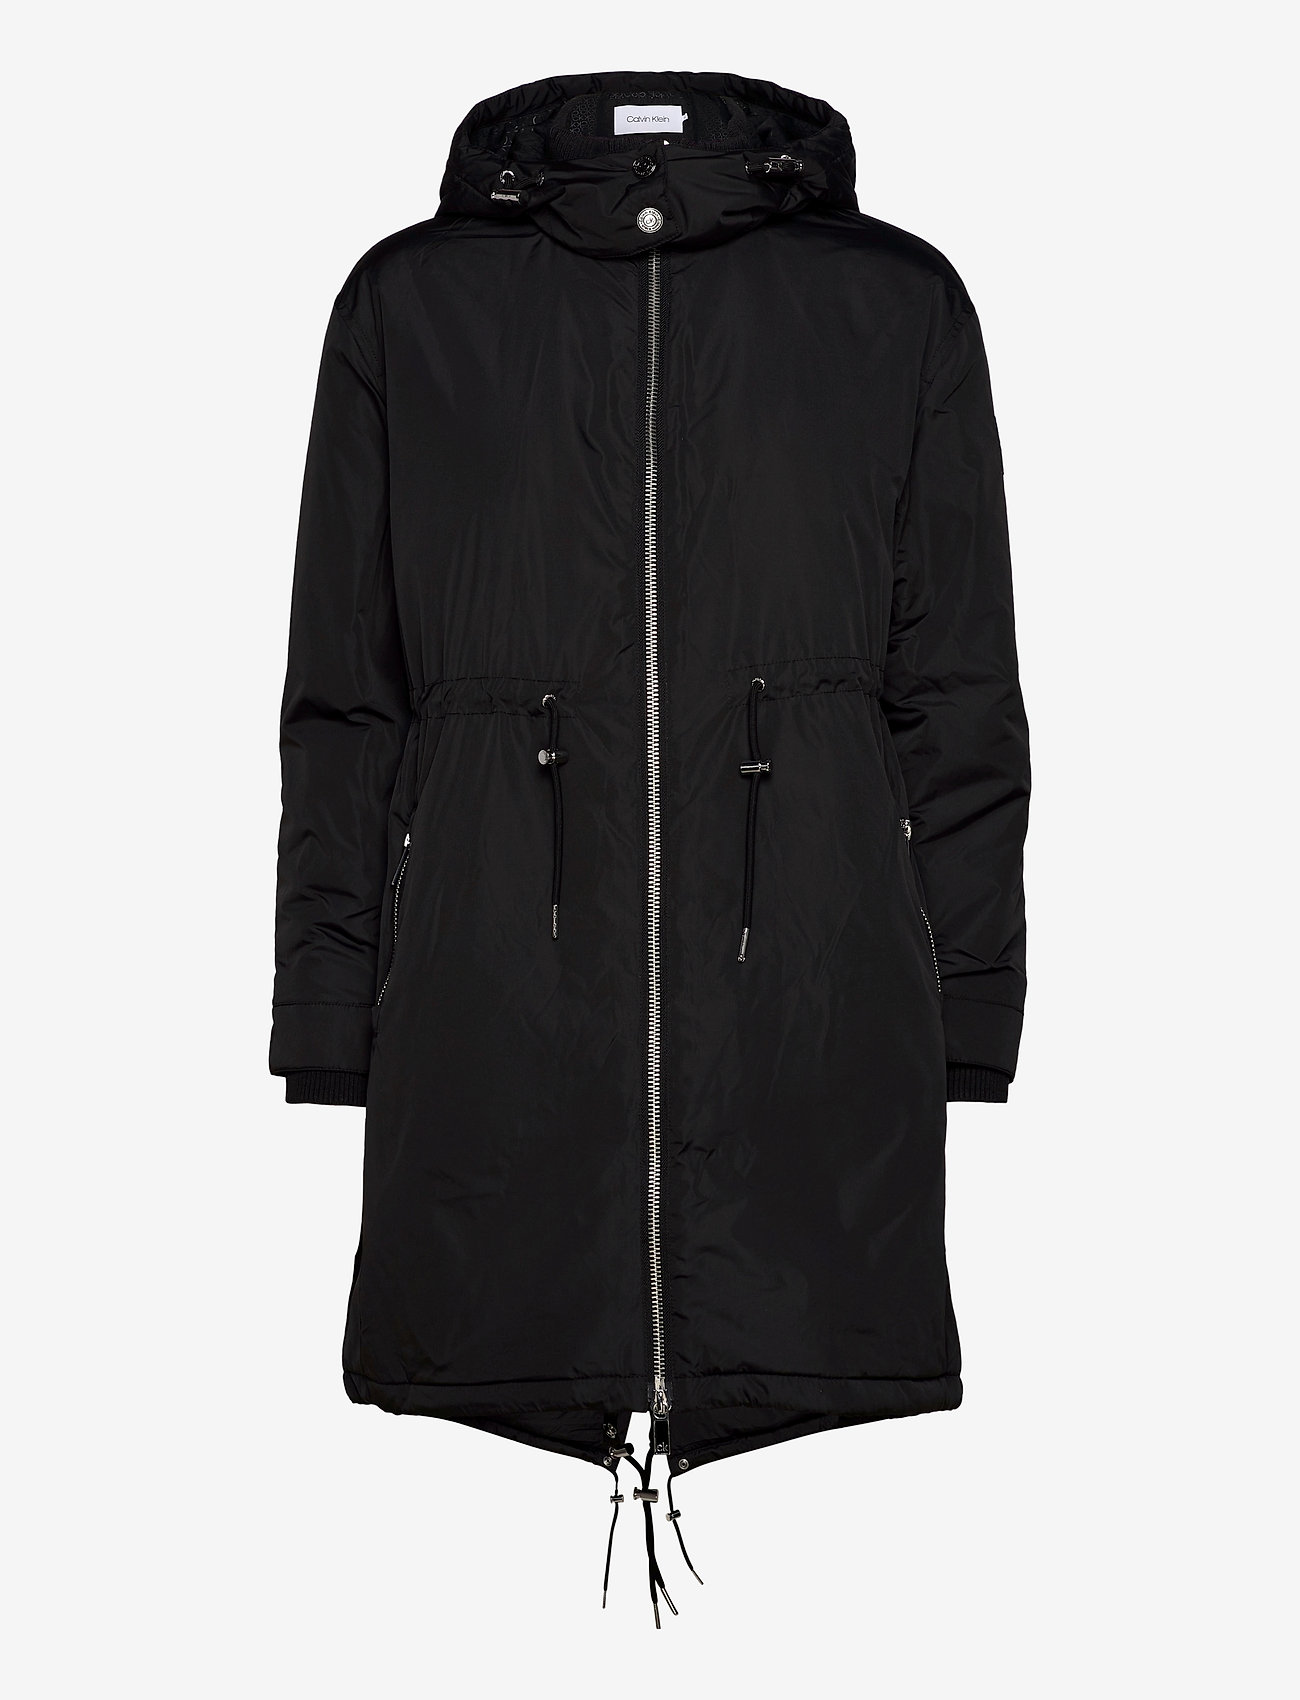 Lightweight Nylon Parka (Ck Black) (3200 kr) - Calvin Klein